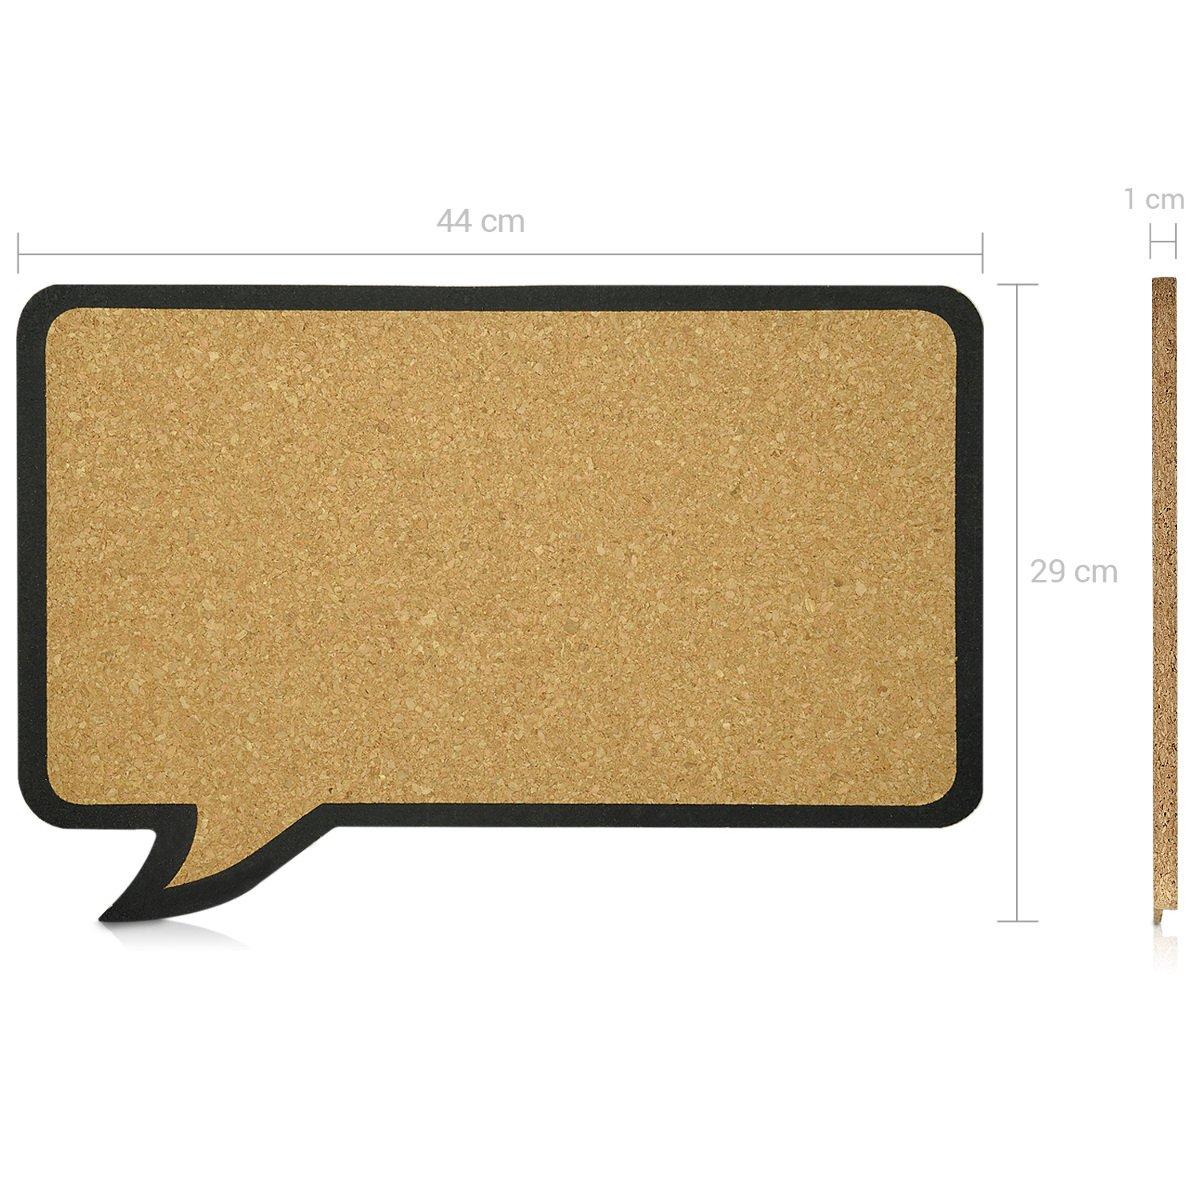 Reindeer Design 29x45cm Navaris Cork Notice Board Includes 10 Pins Message Noticeboard Memo Shape Display Bulletin Pinboard for Home or Bedroom